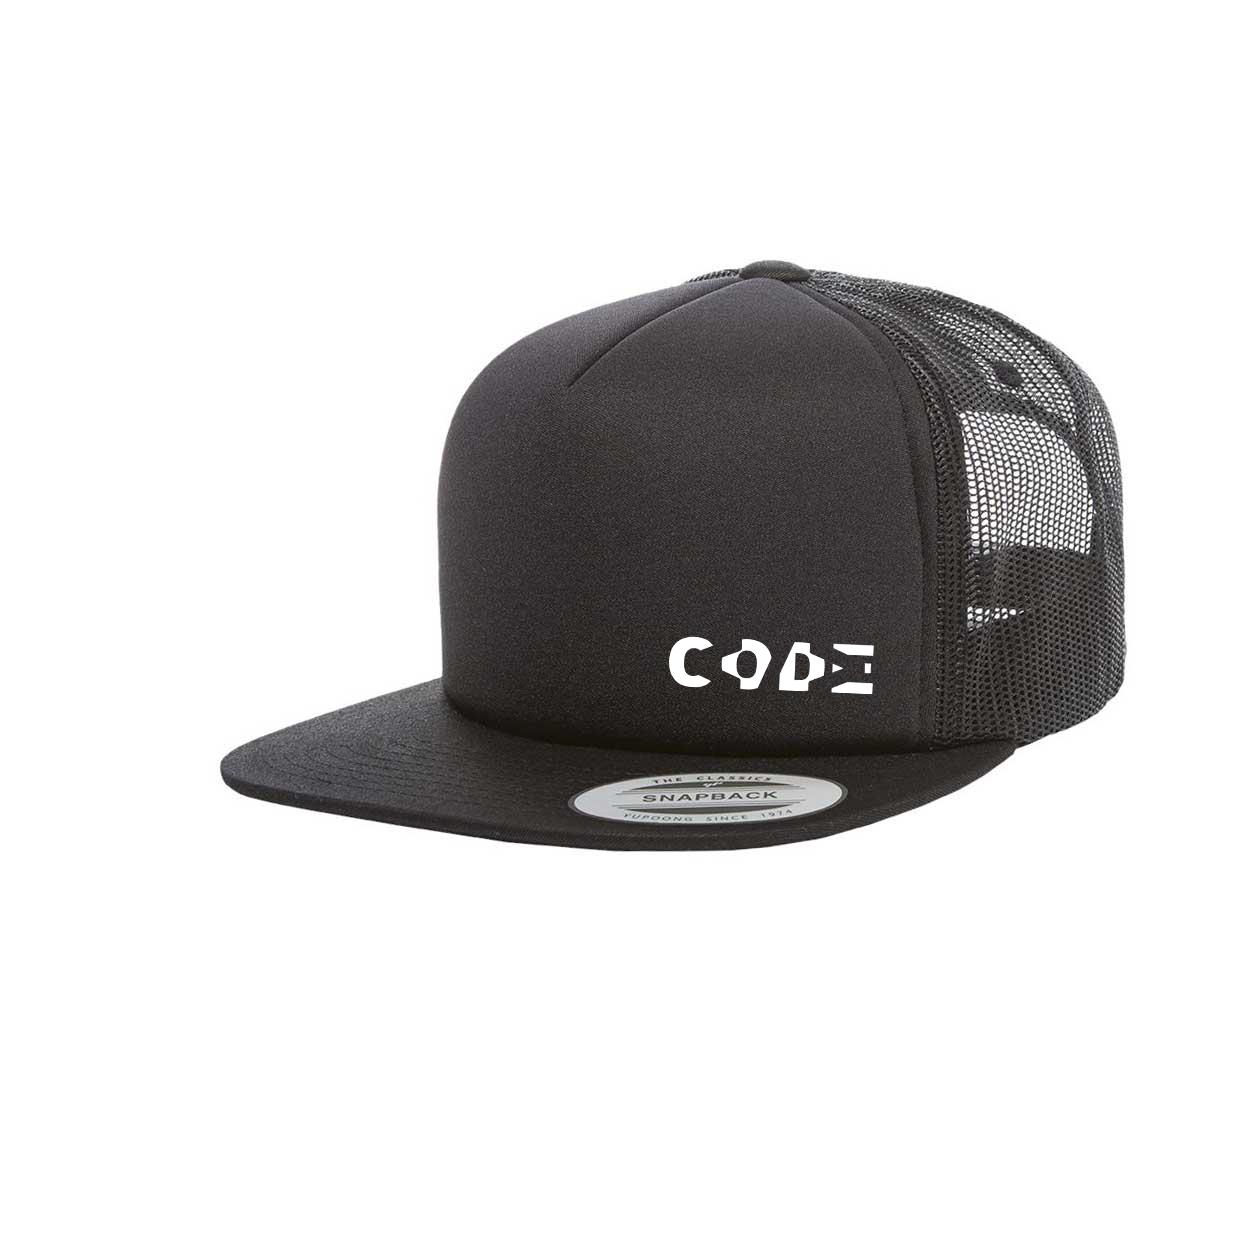 Code Tag Logo Night Out Premium Foam Flat Brim Snapback Hat Black (White Logo)